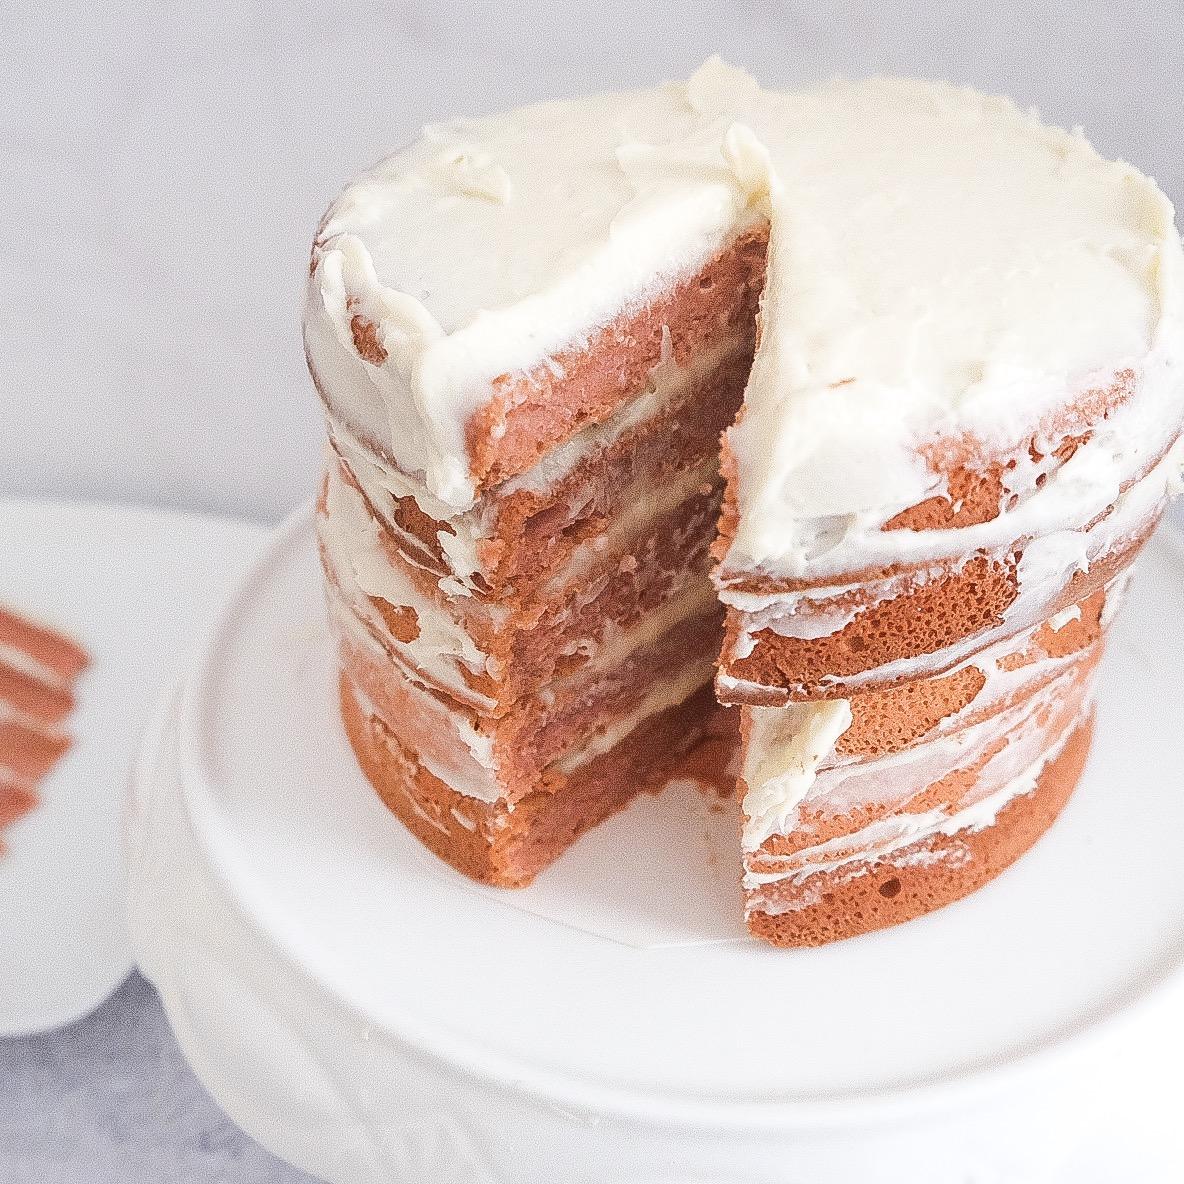 Baking My First Cake: Guava Cake